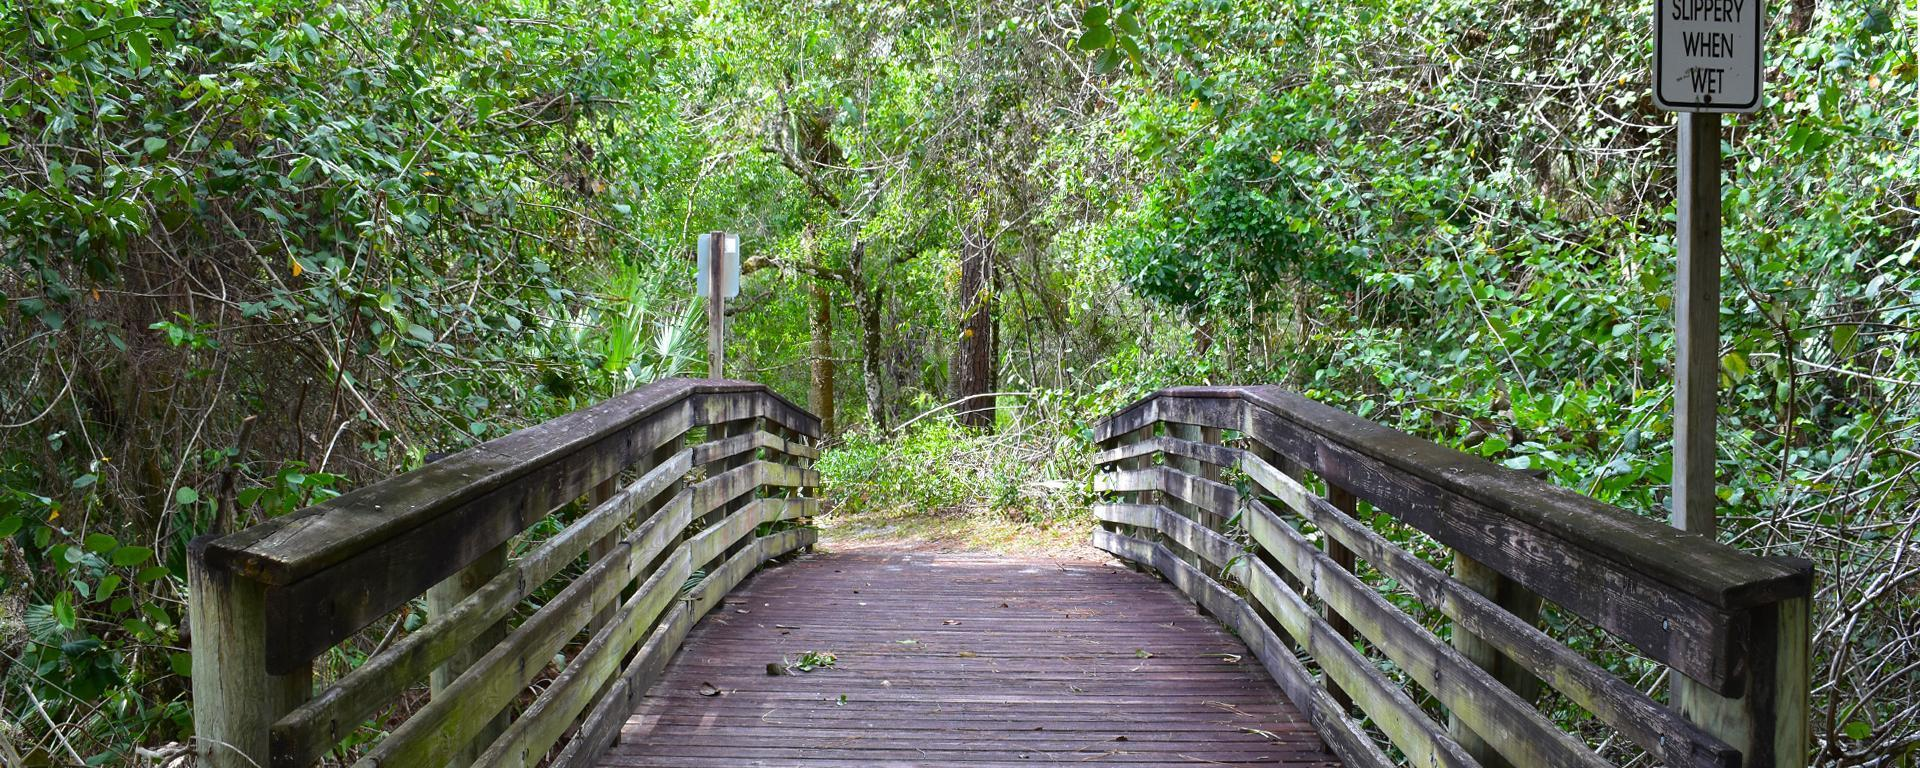 a bridge at Halpatiokee Regional Park